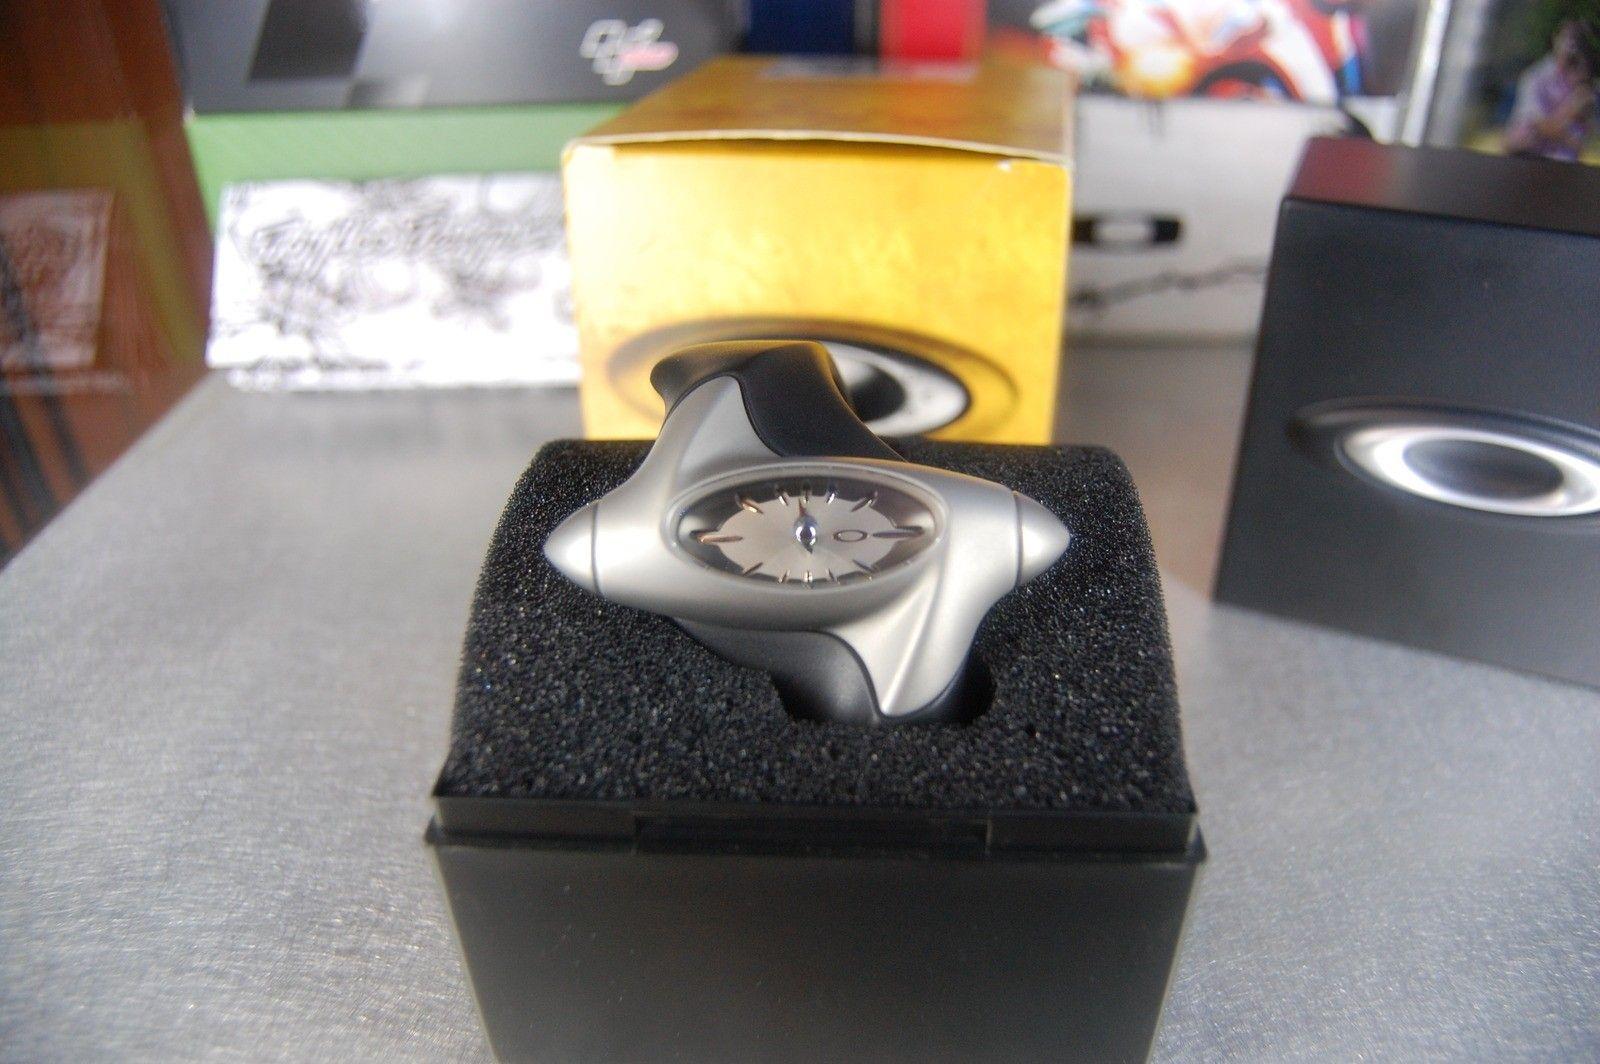 Telmex Racing EP1, Todd Francis 1 Bird EP1, BNIB Gascan Lenses,  Flak Lenses, Torpedo Watch - dsc10044-jpg.54654.jpg